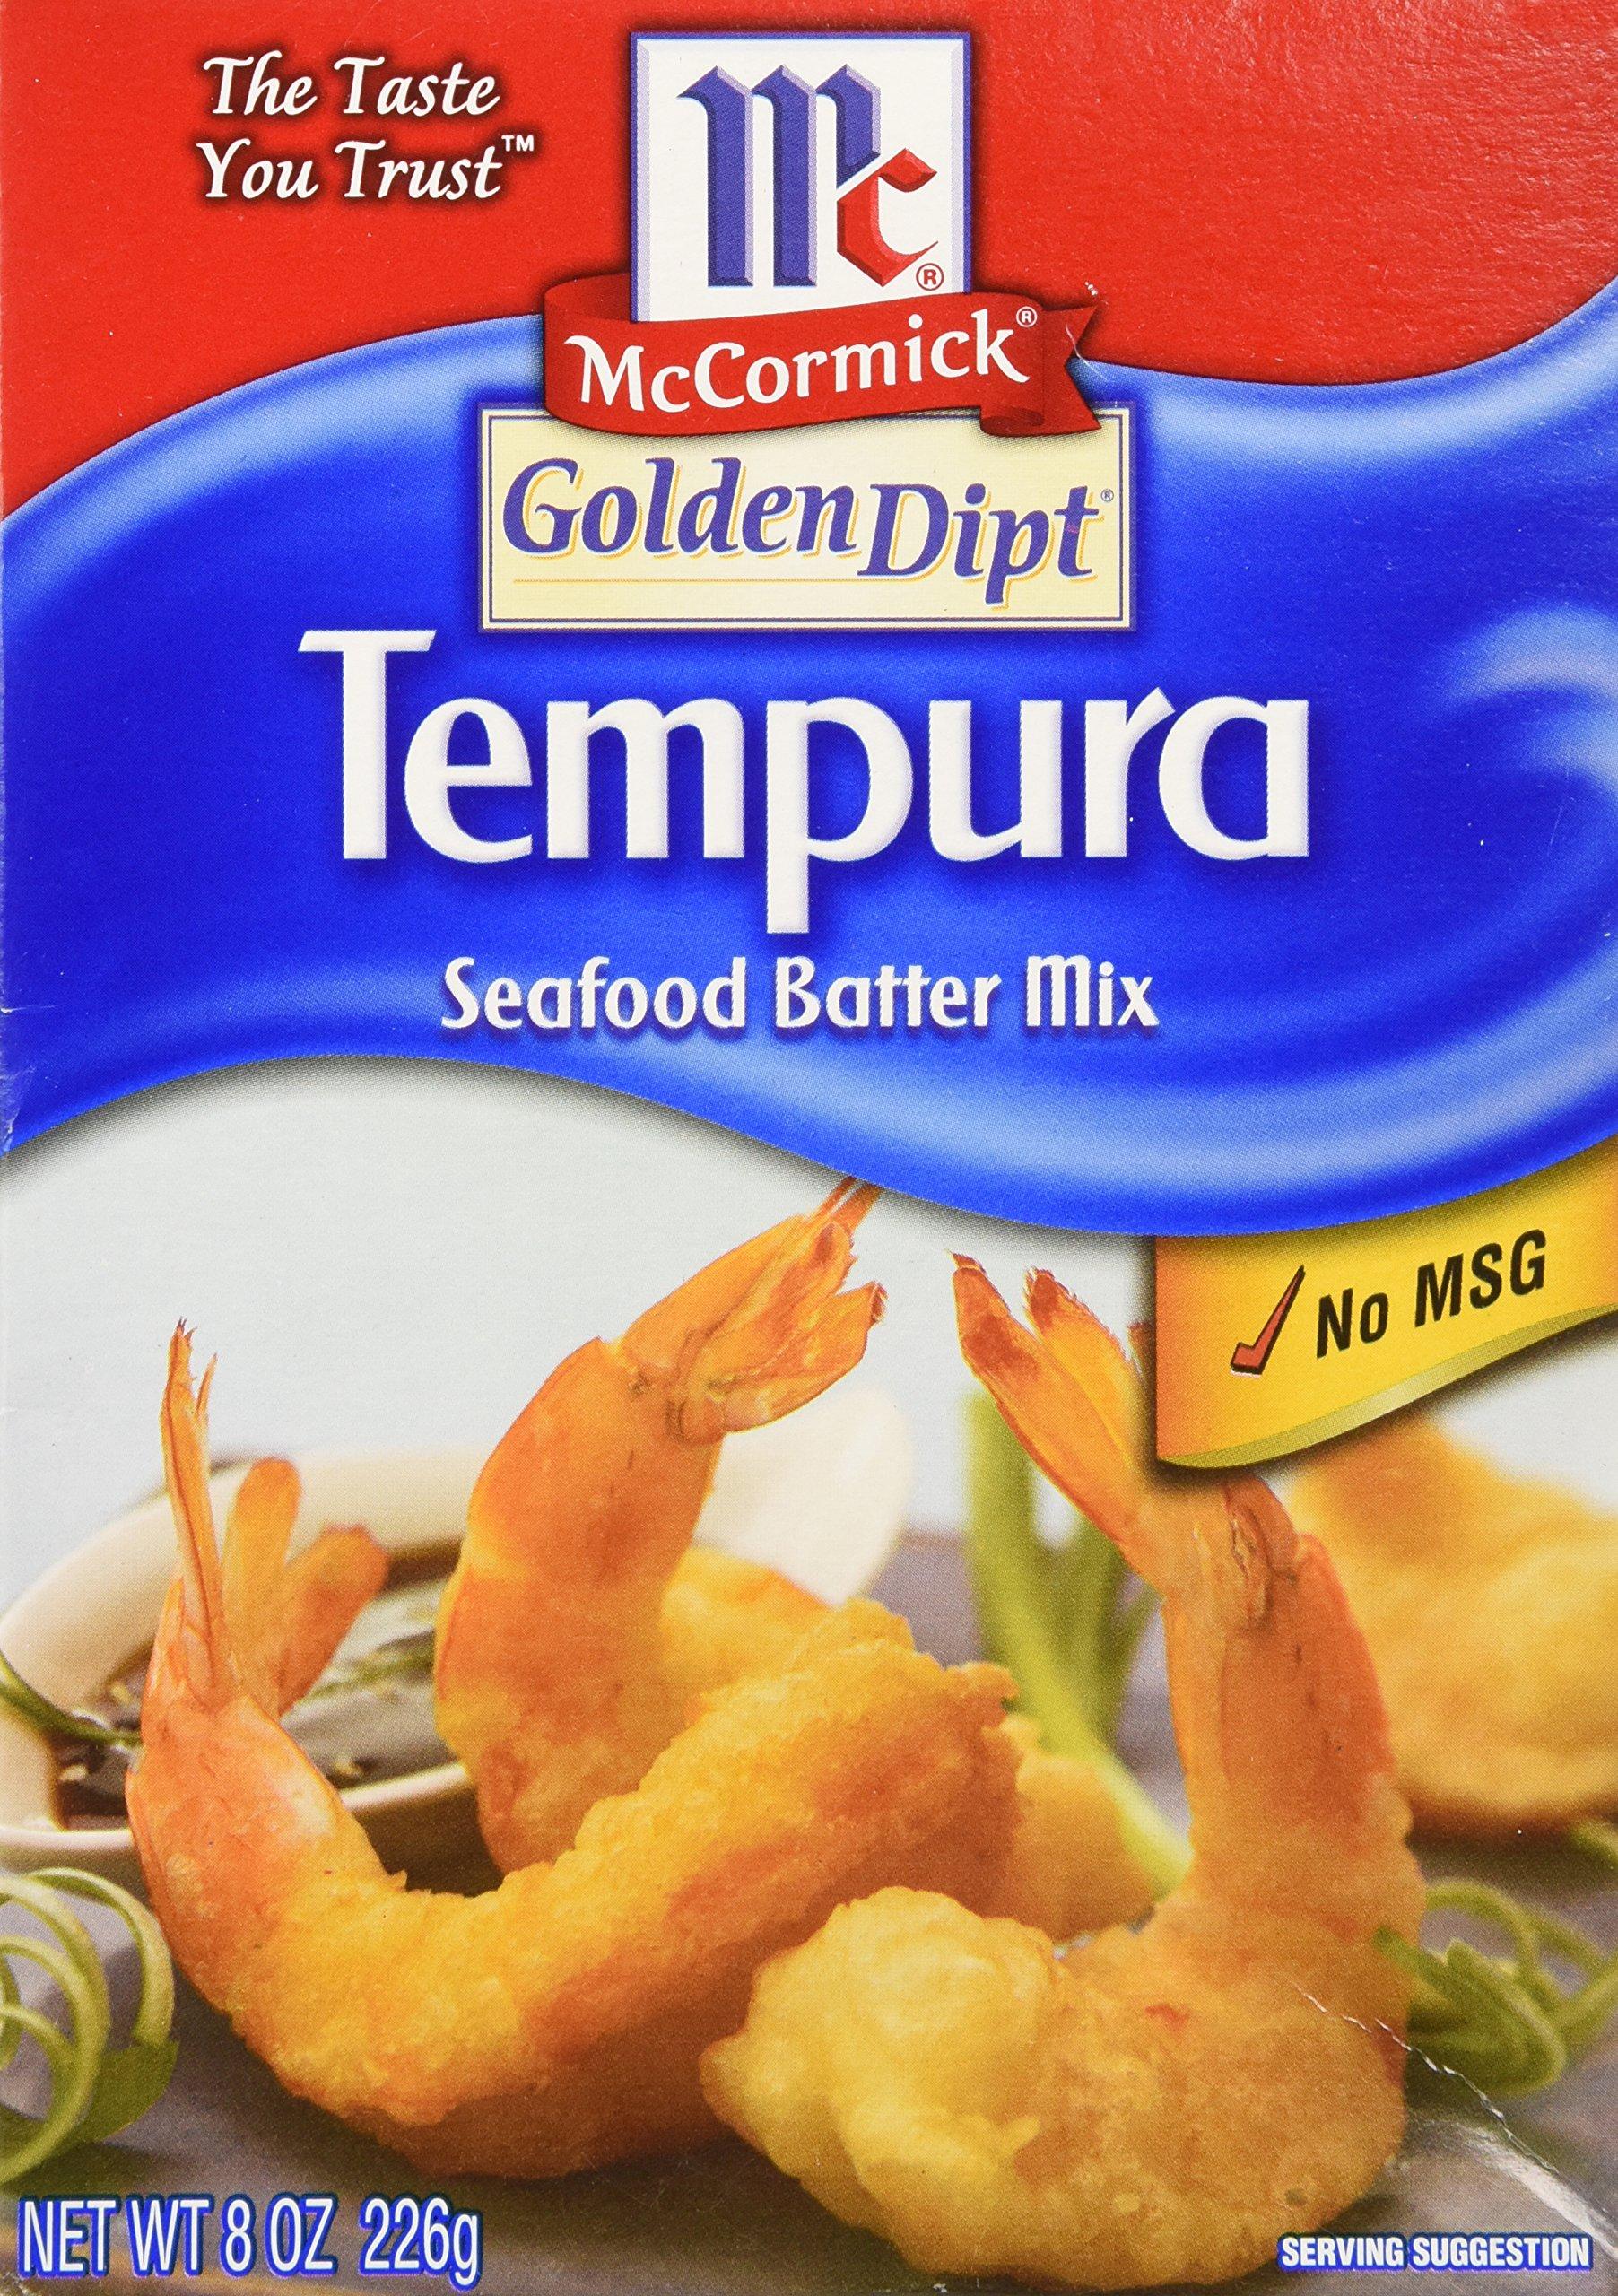 McCormick Golden Dipt Tempura Seafood Batter Mix 8 Ounces (Pack of 3) by Golden Dipt